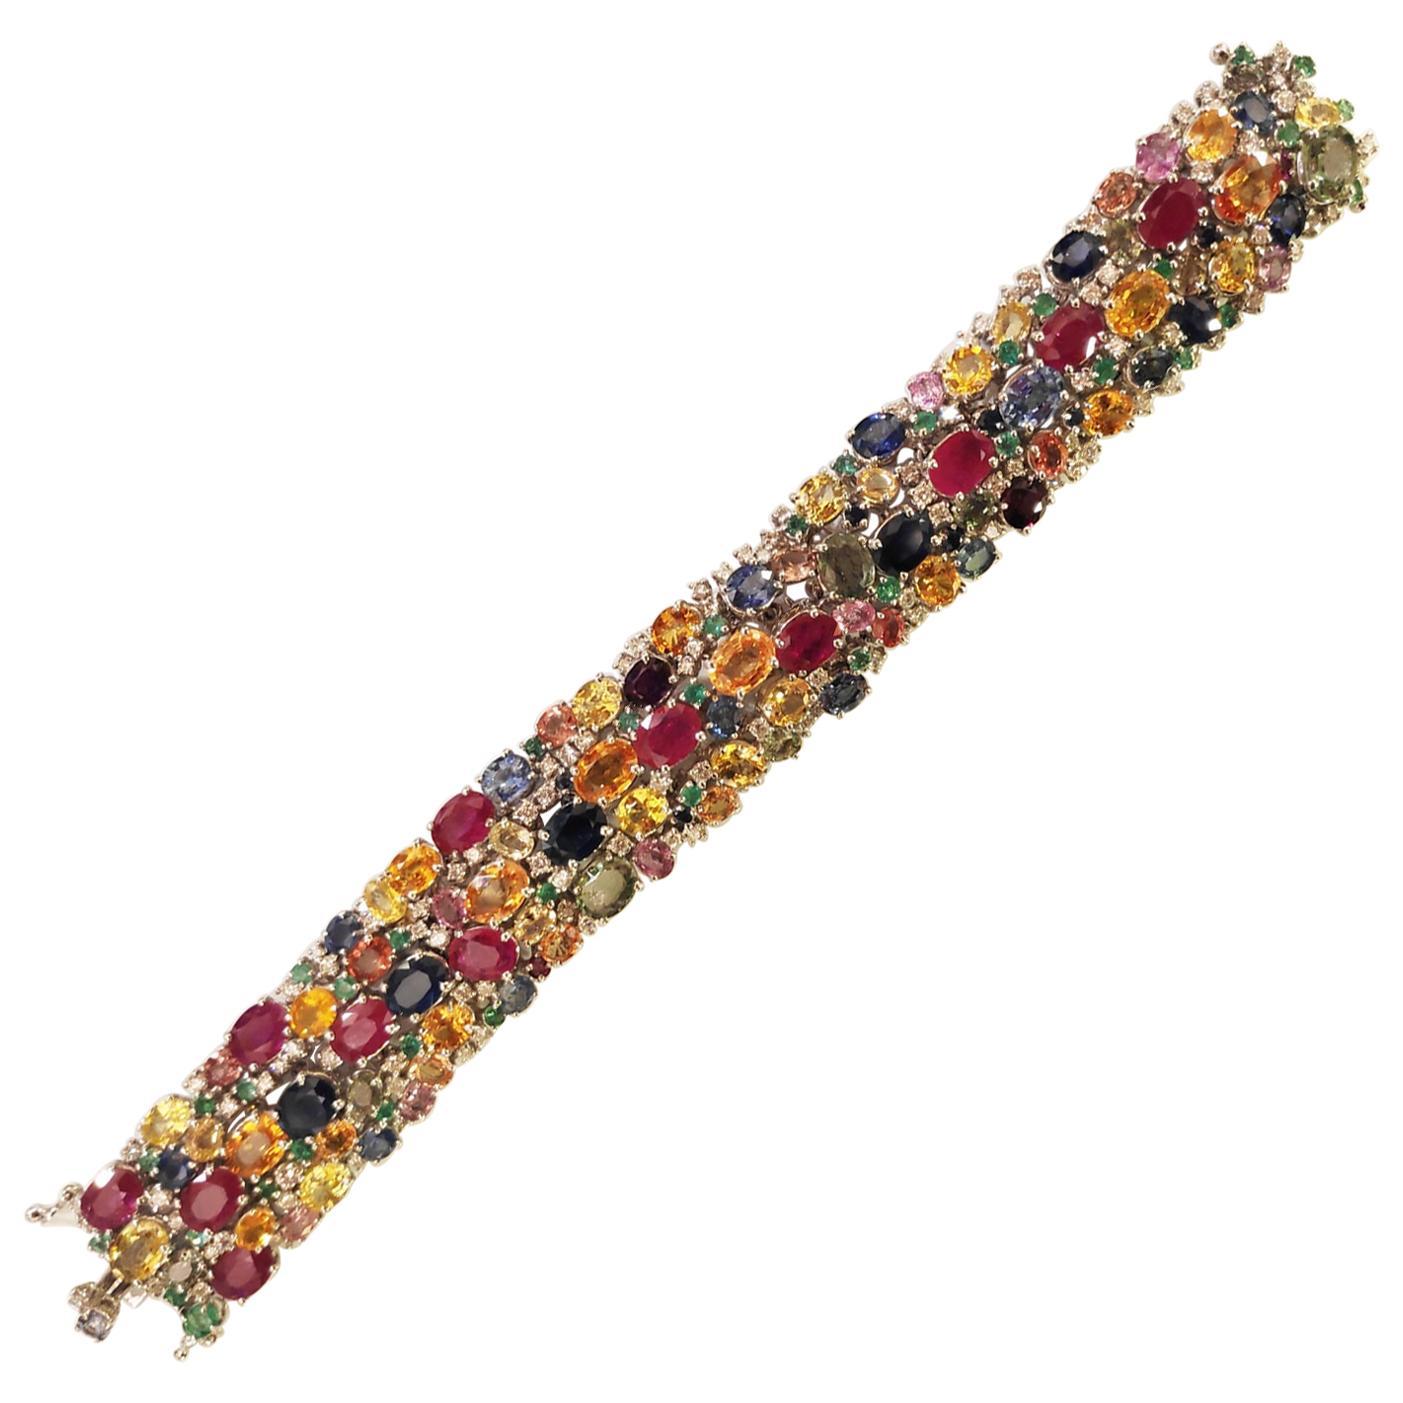 18 Karat Gold Bracelet Multicolored Sapphires, Emeralds, Rubies and Diamonds